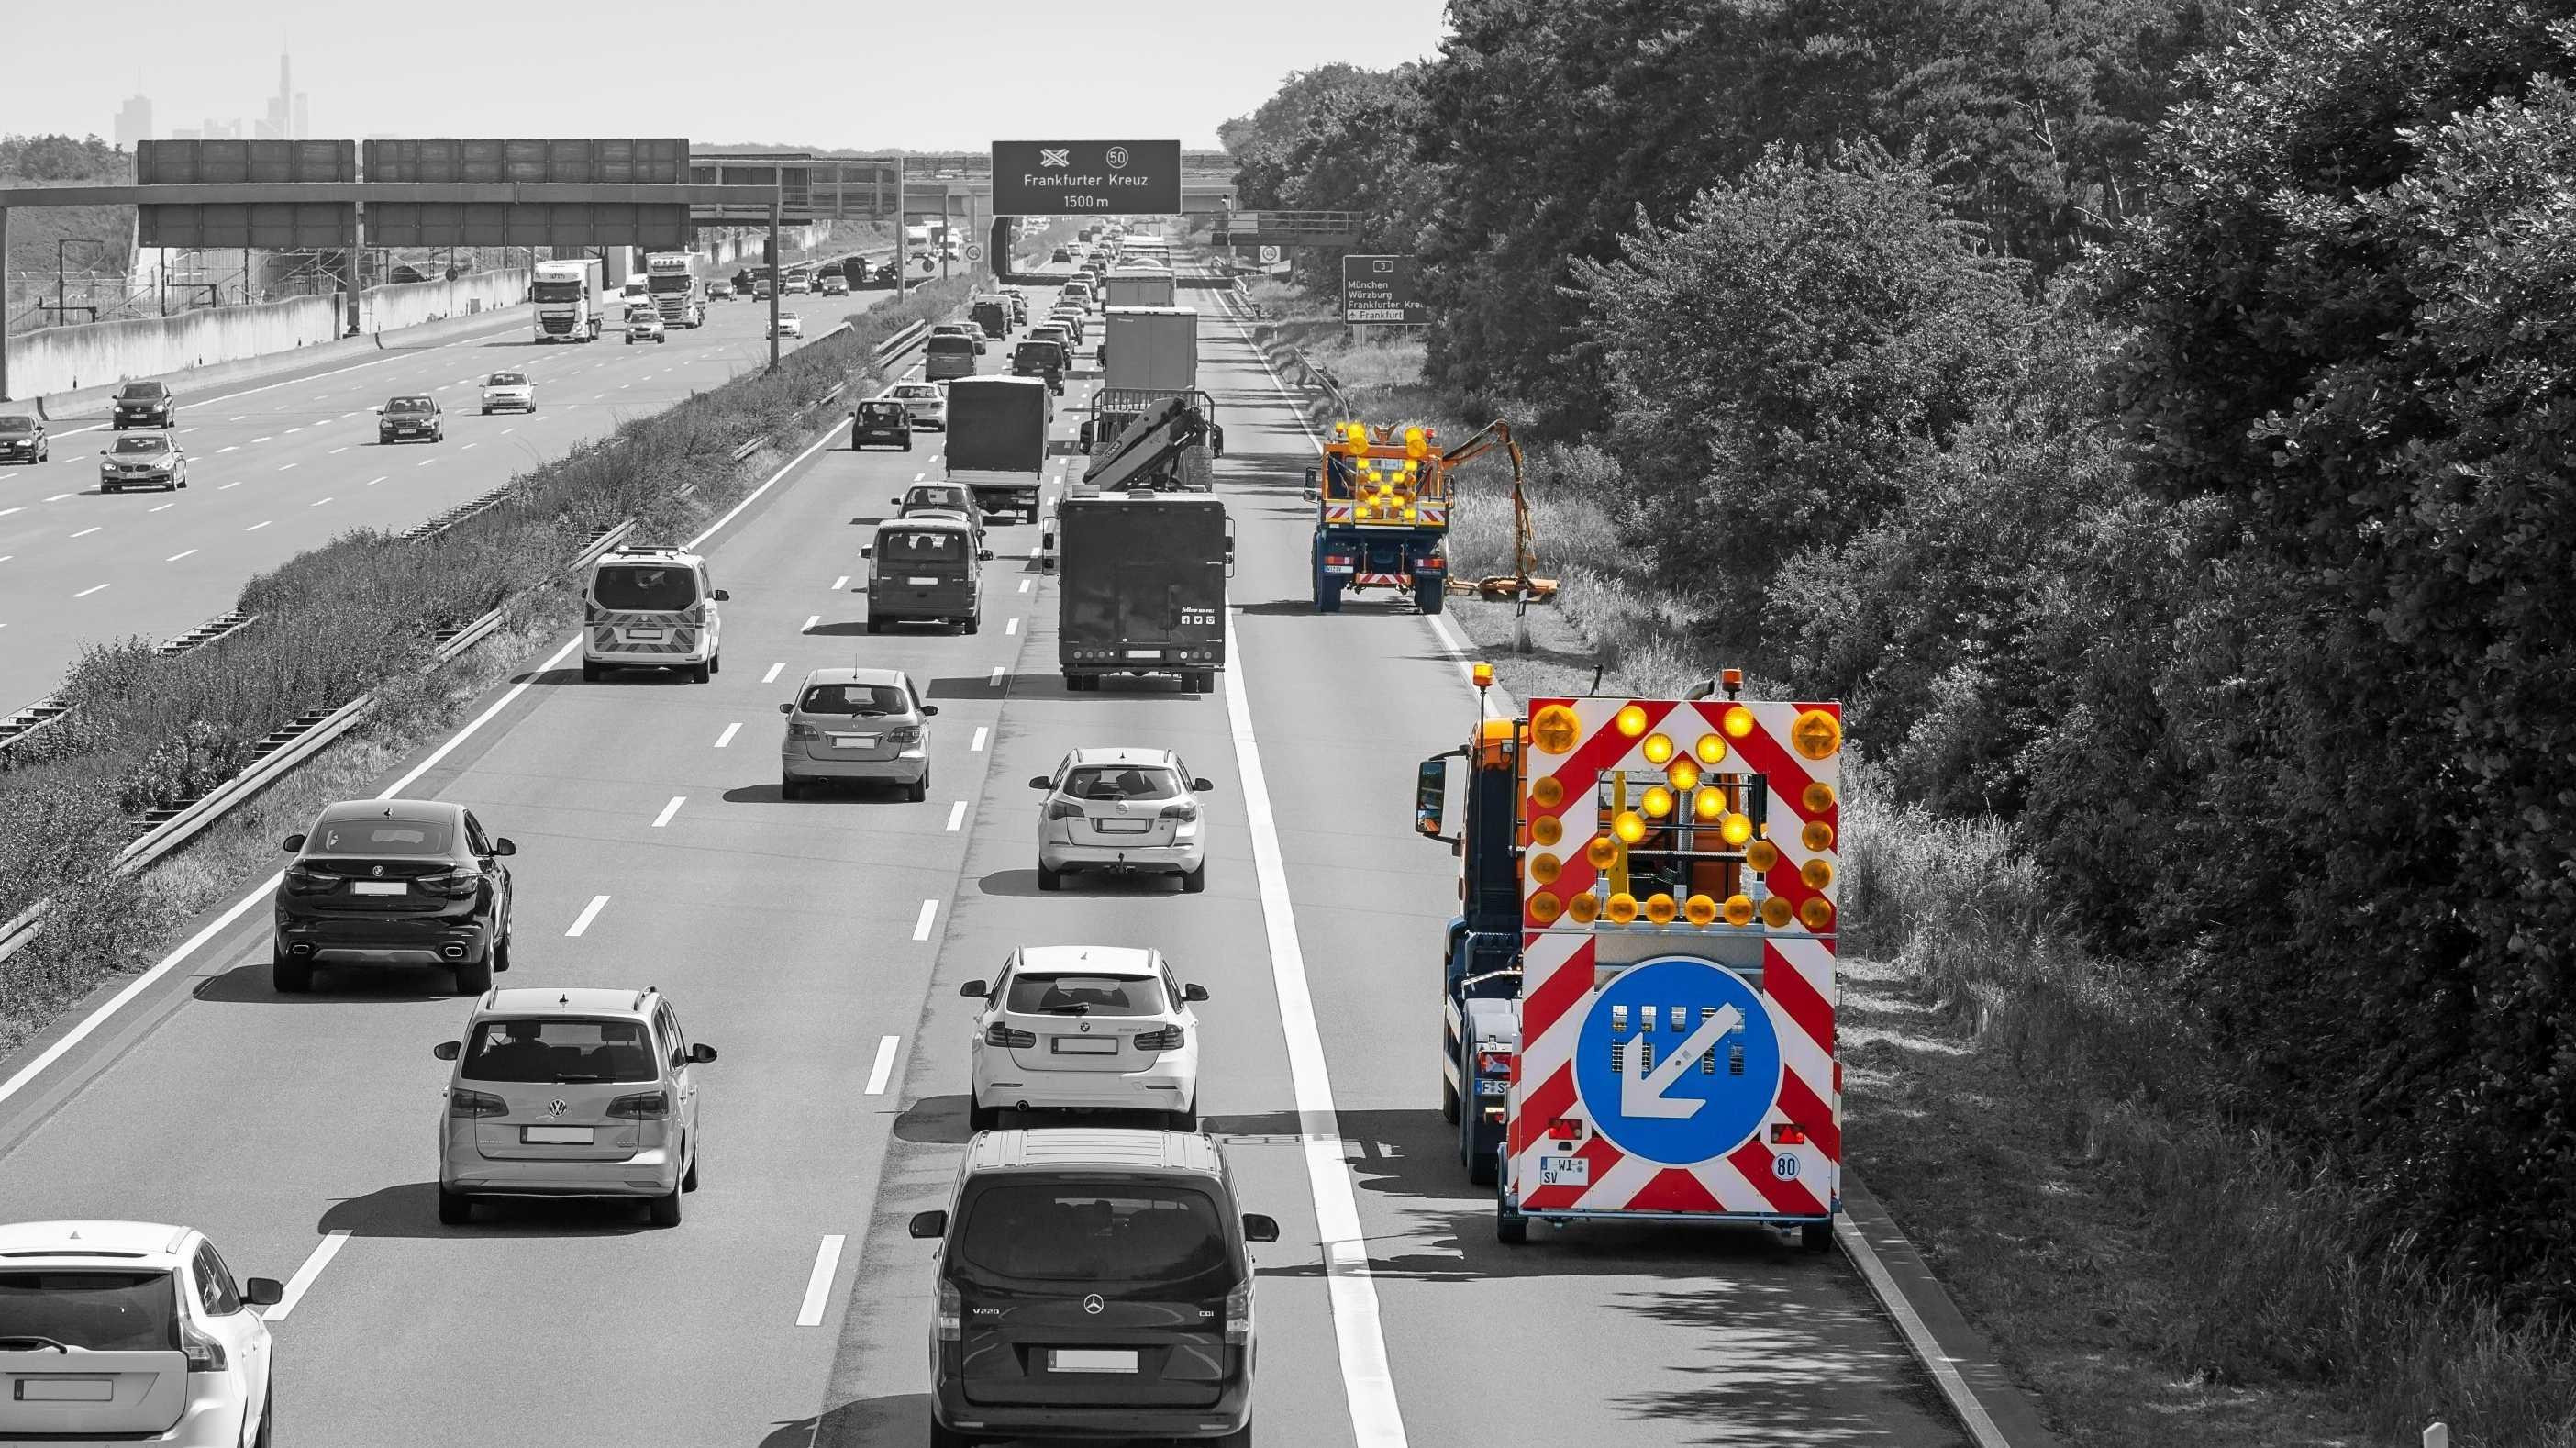 Autonome Autos: Fahrerloser Lkw sichert Wanderbaustelle ab